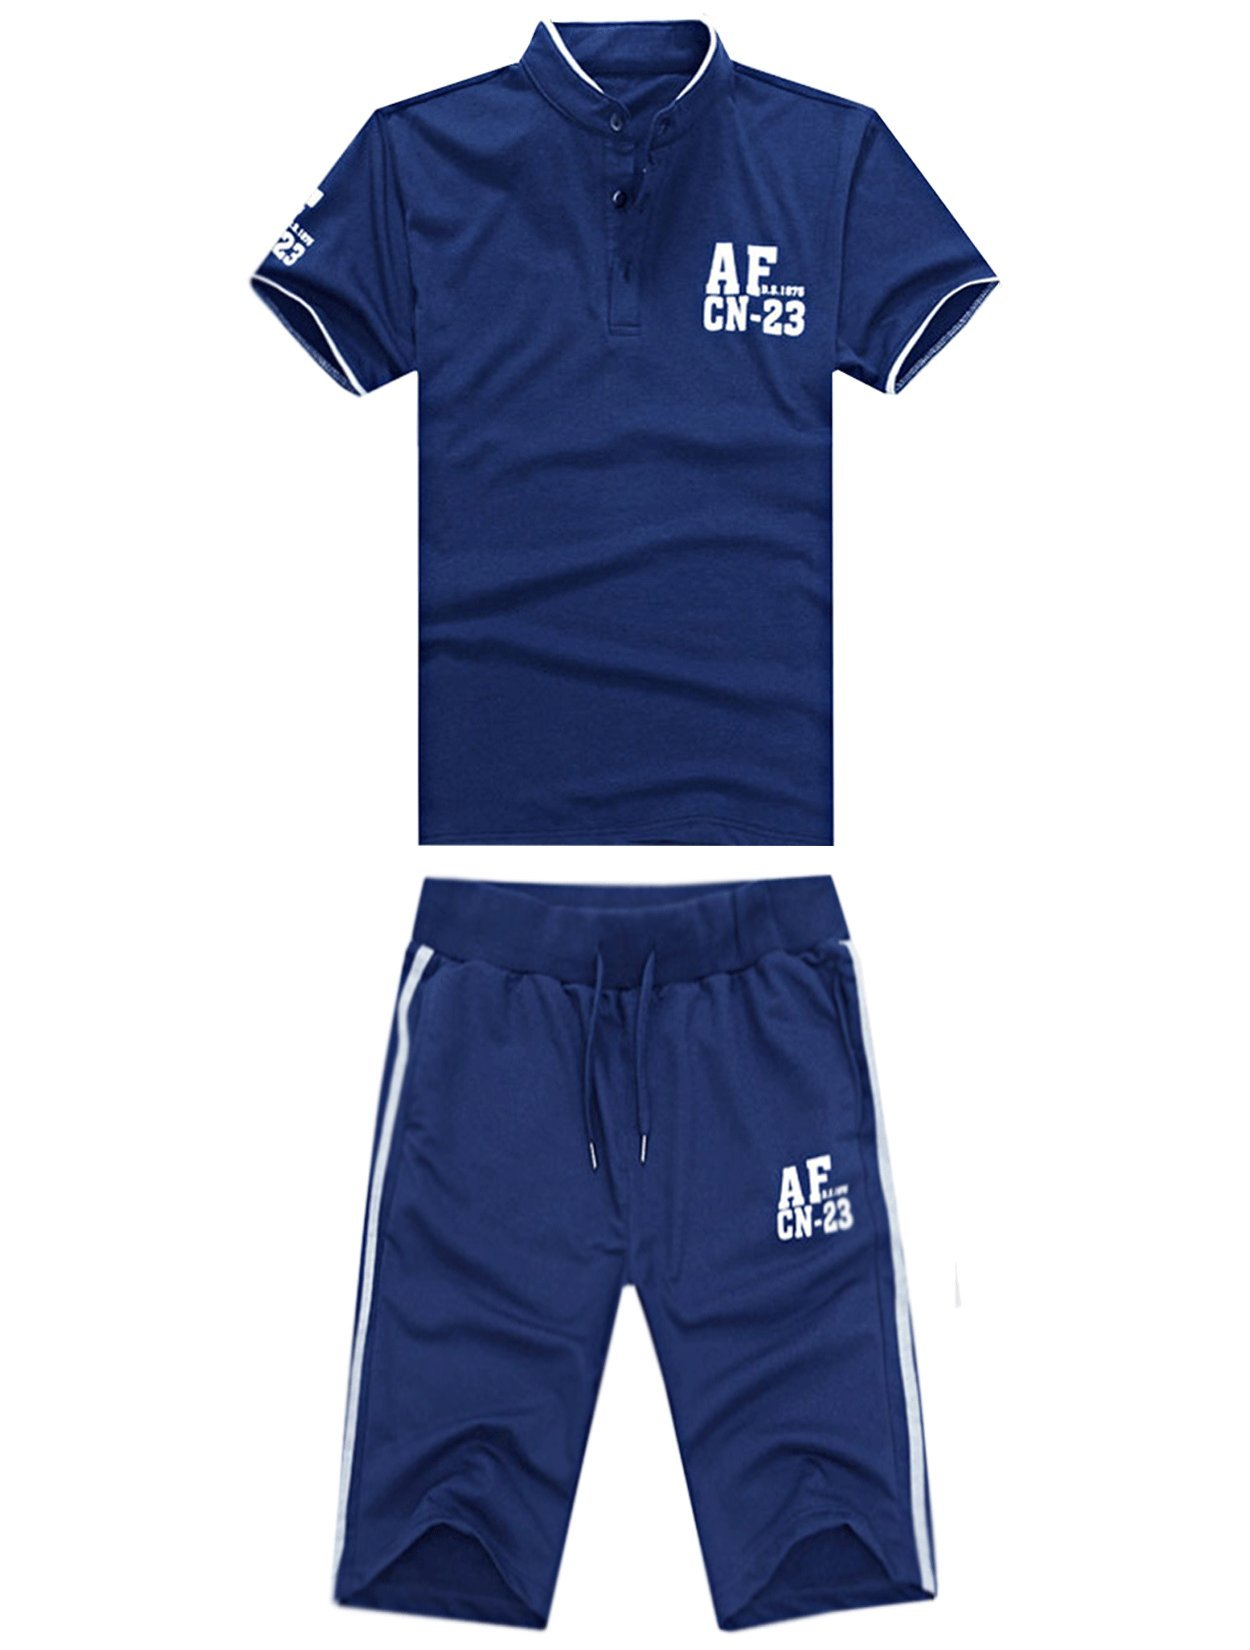 Unomatch Boys Tennis Clothing Short Sleeve T-shirt with Raid Shorts (Medium, Blue)